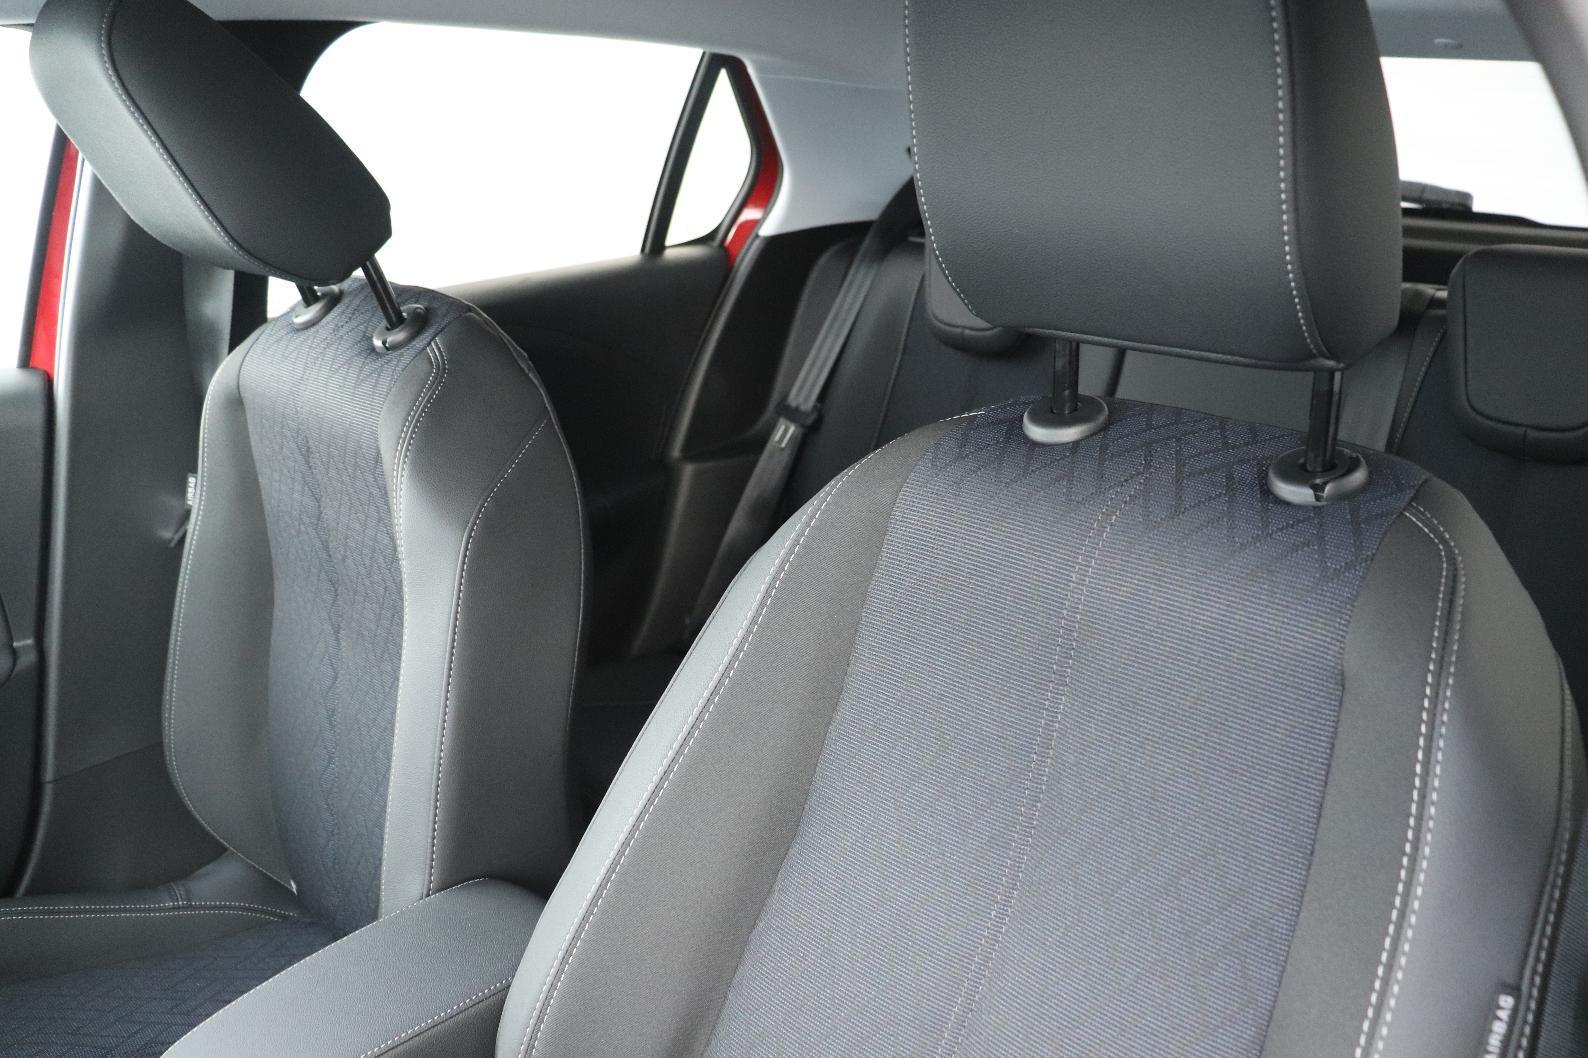 OPEL CORSA 1.2 Turbo 100 ch BVA8 Elegance